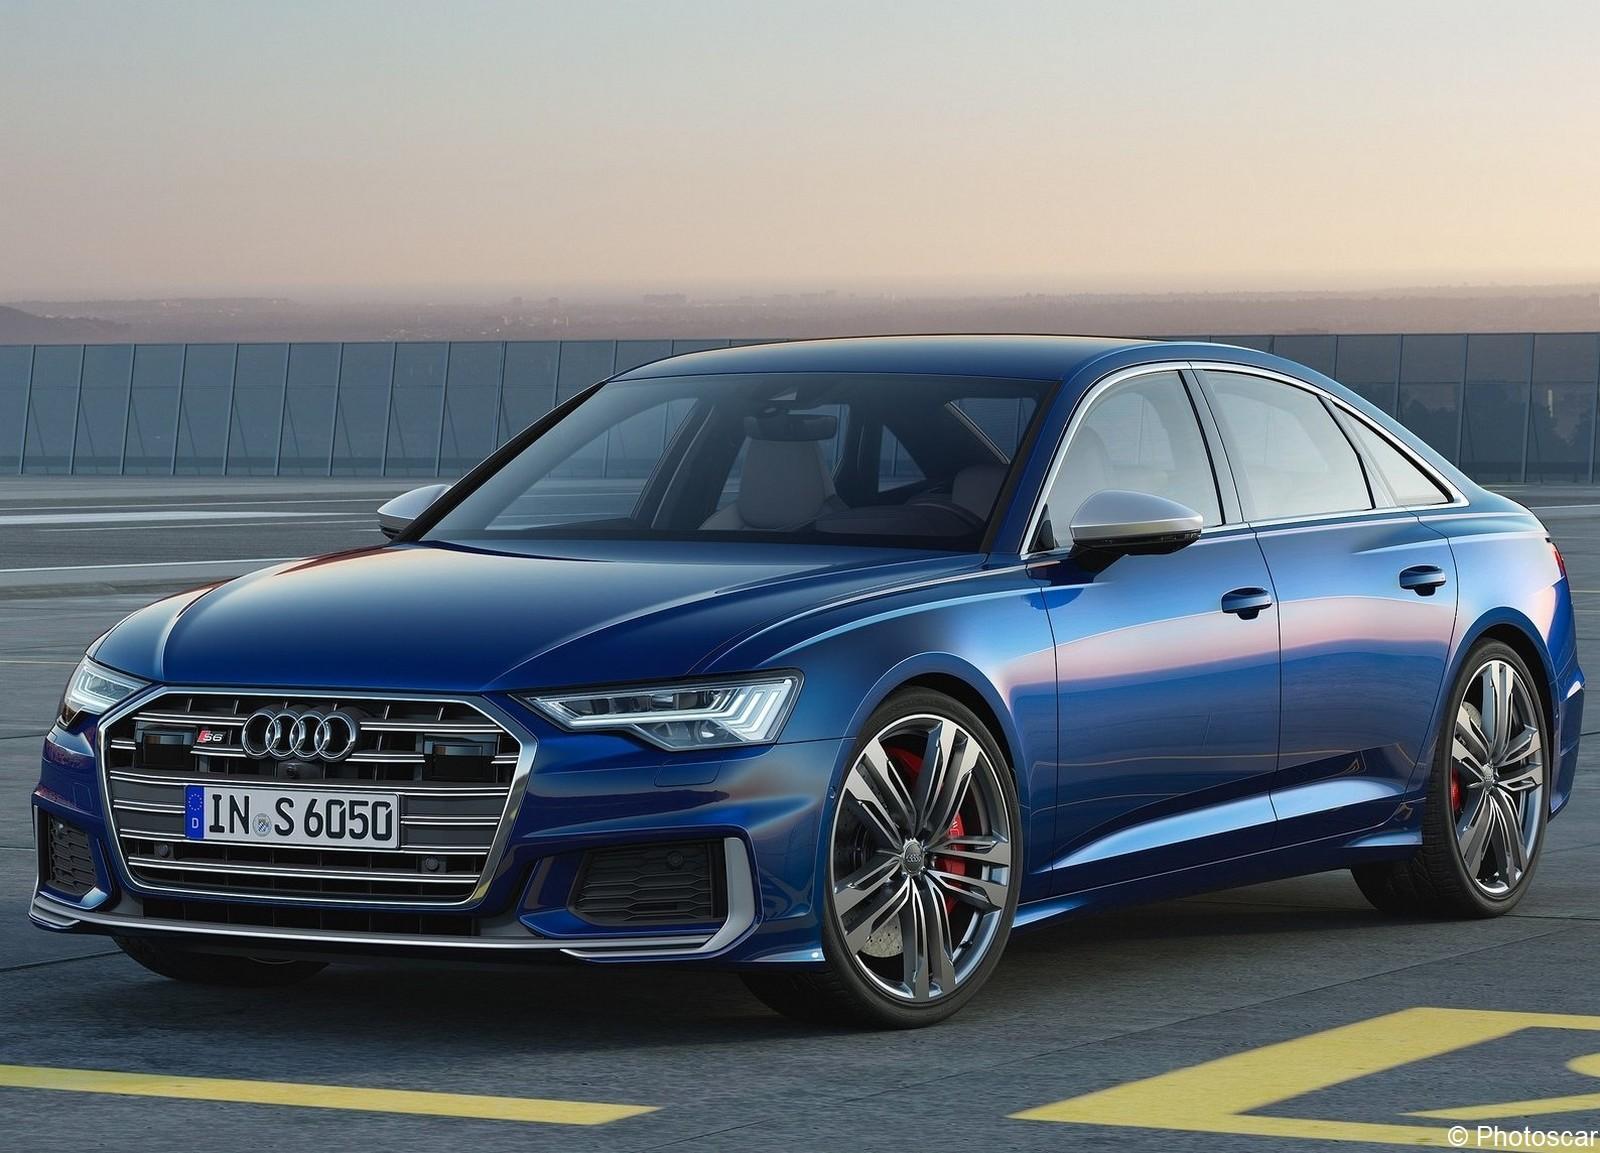 Audi S6 Sedan TDI 2020